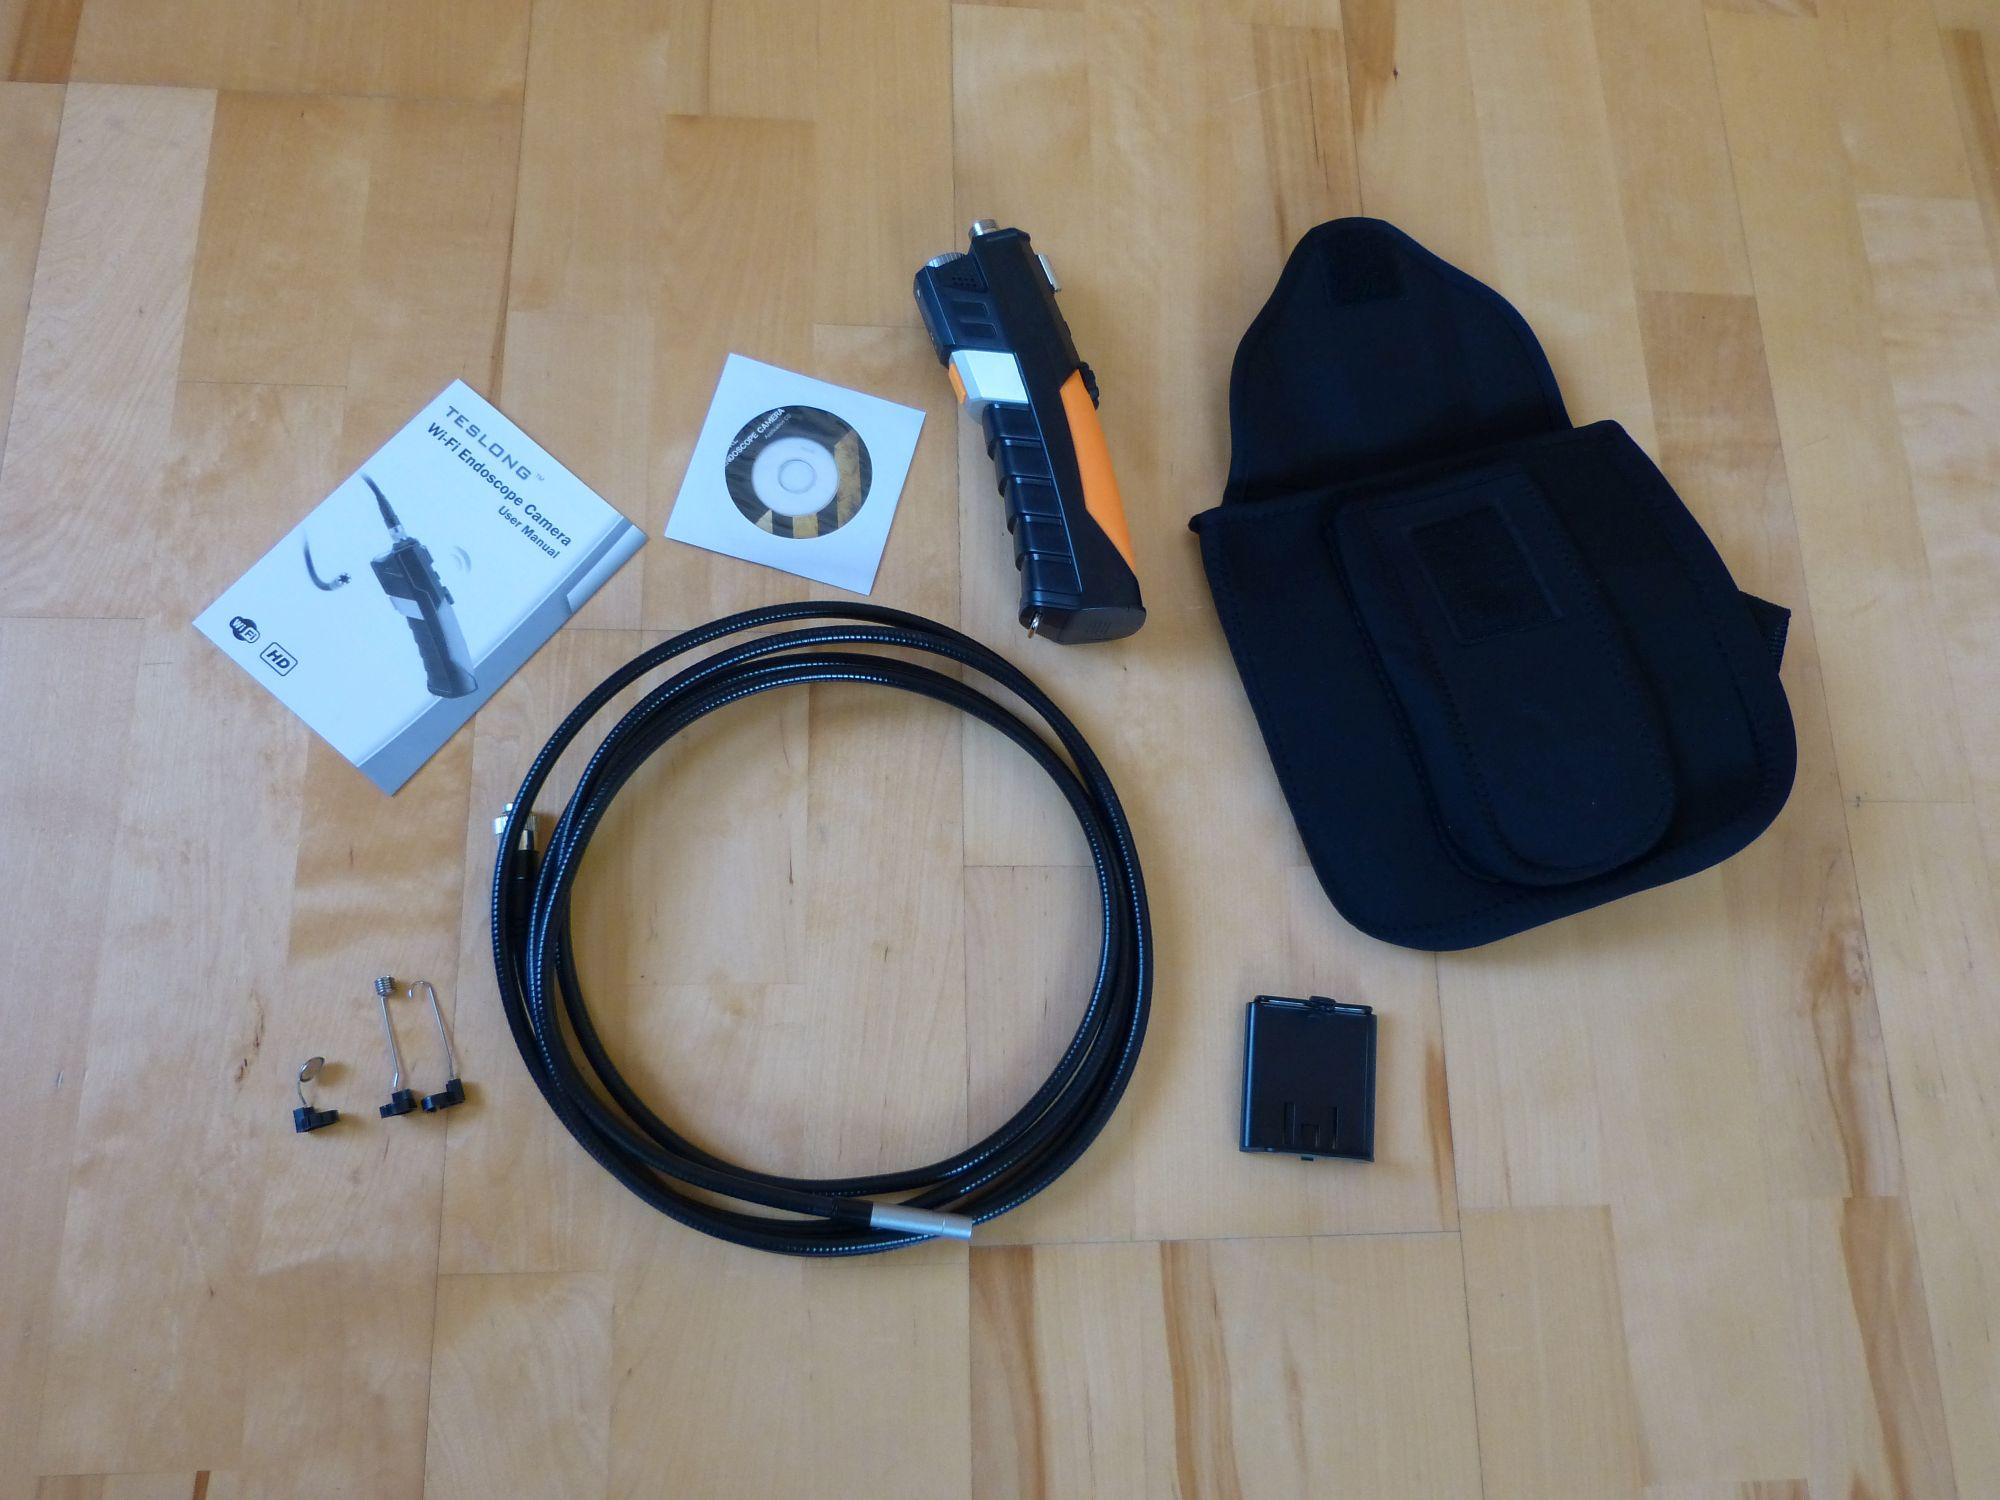 Testbericht Depstech WiFi Endoskopkamera HD | Micha's Blog